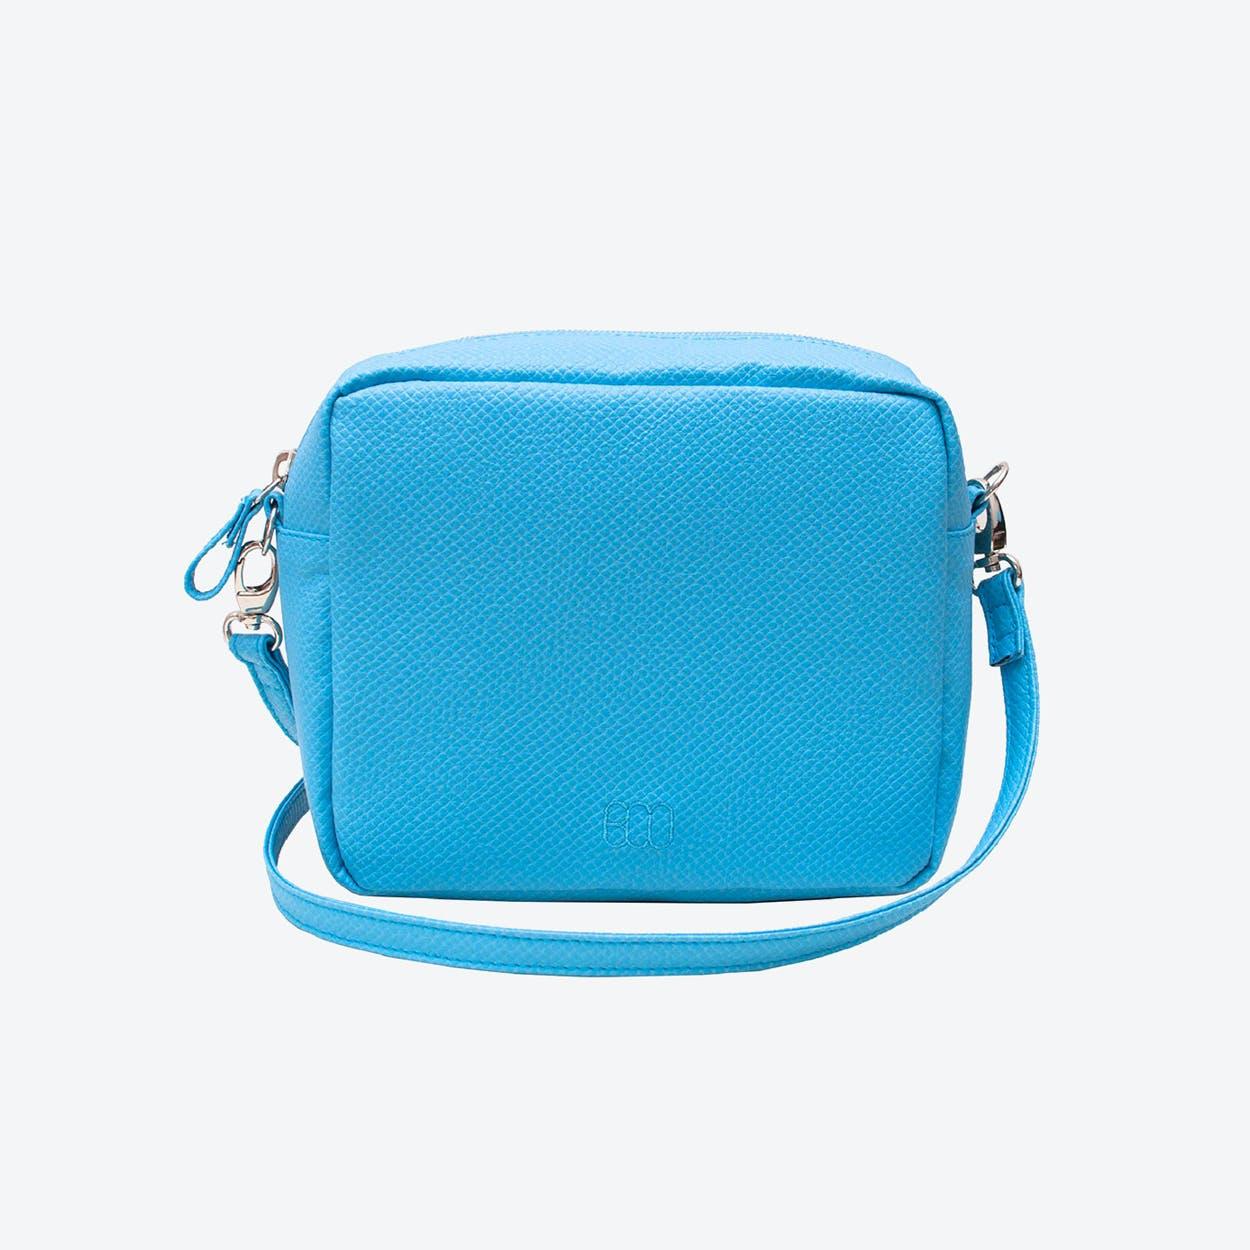 Box Crossbody Bag in Blue